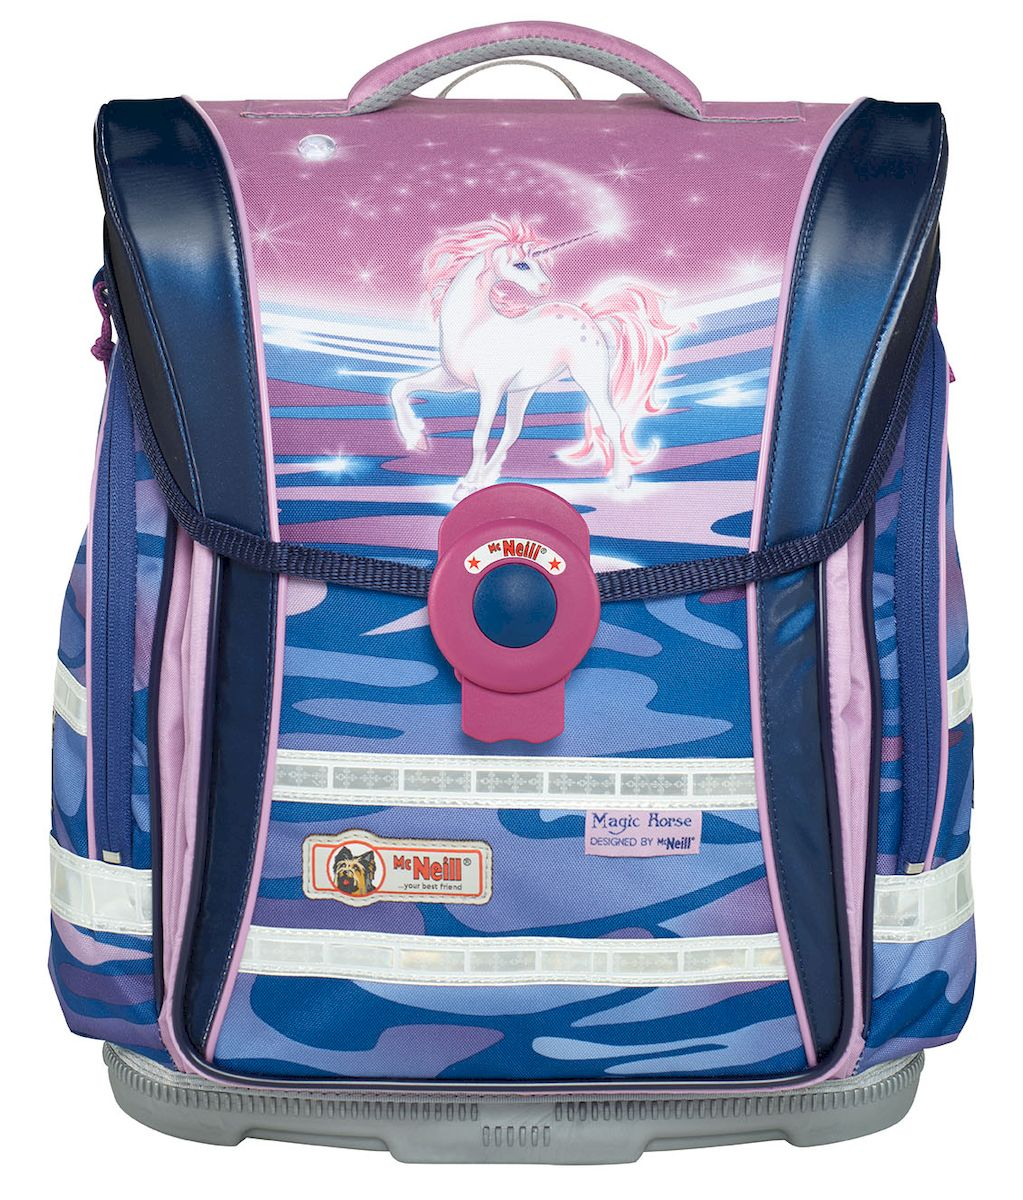 McNeill Ранец школьный Ergo Light Compact Единорог